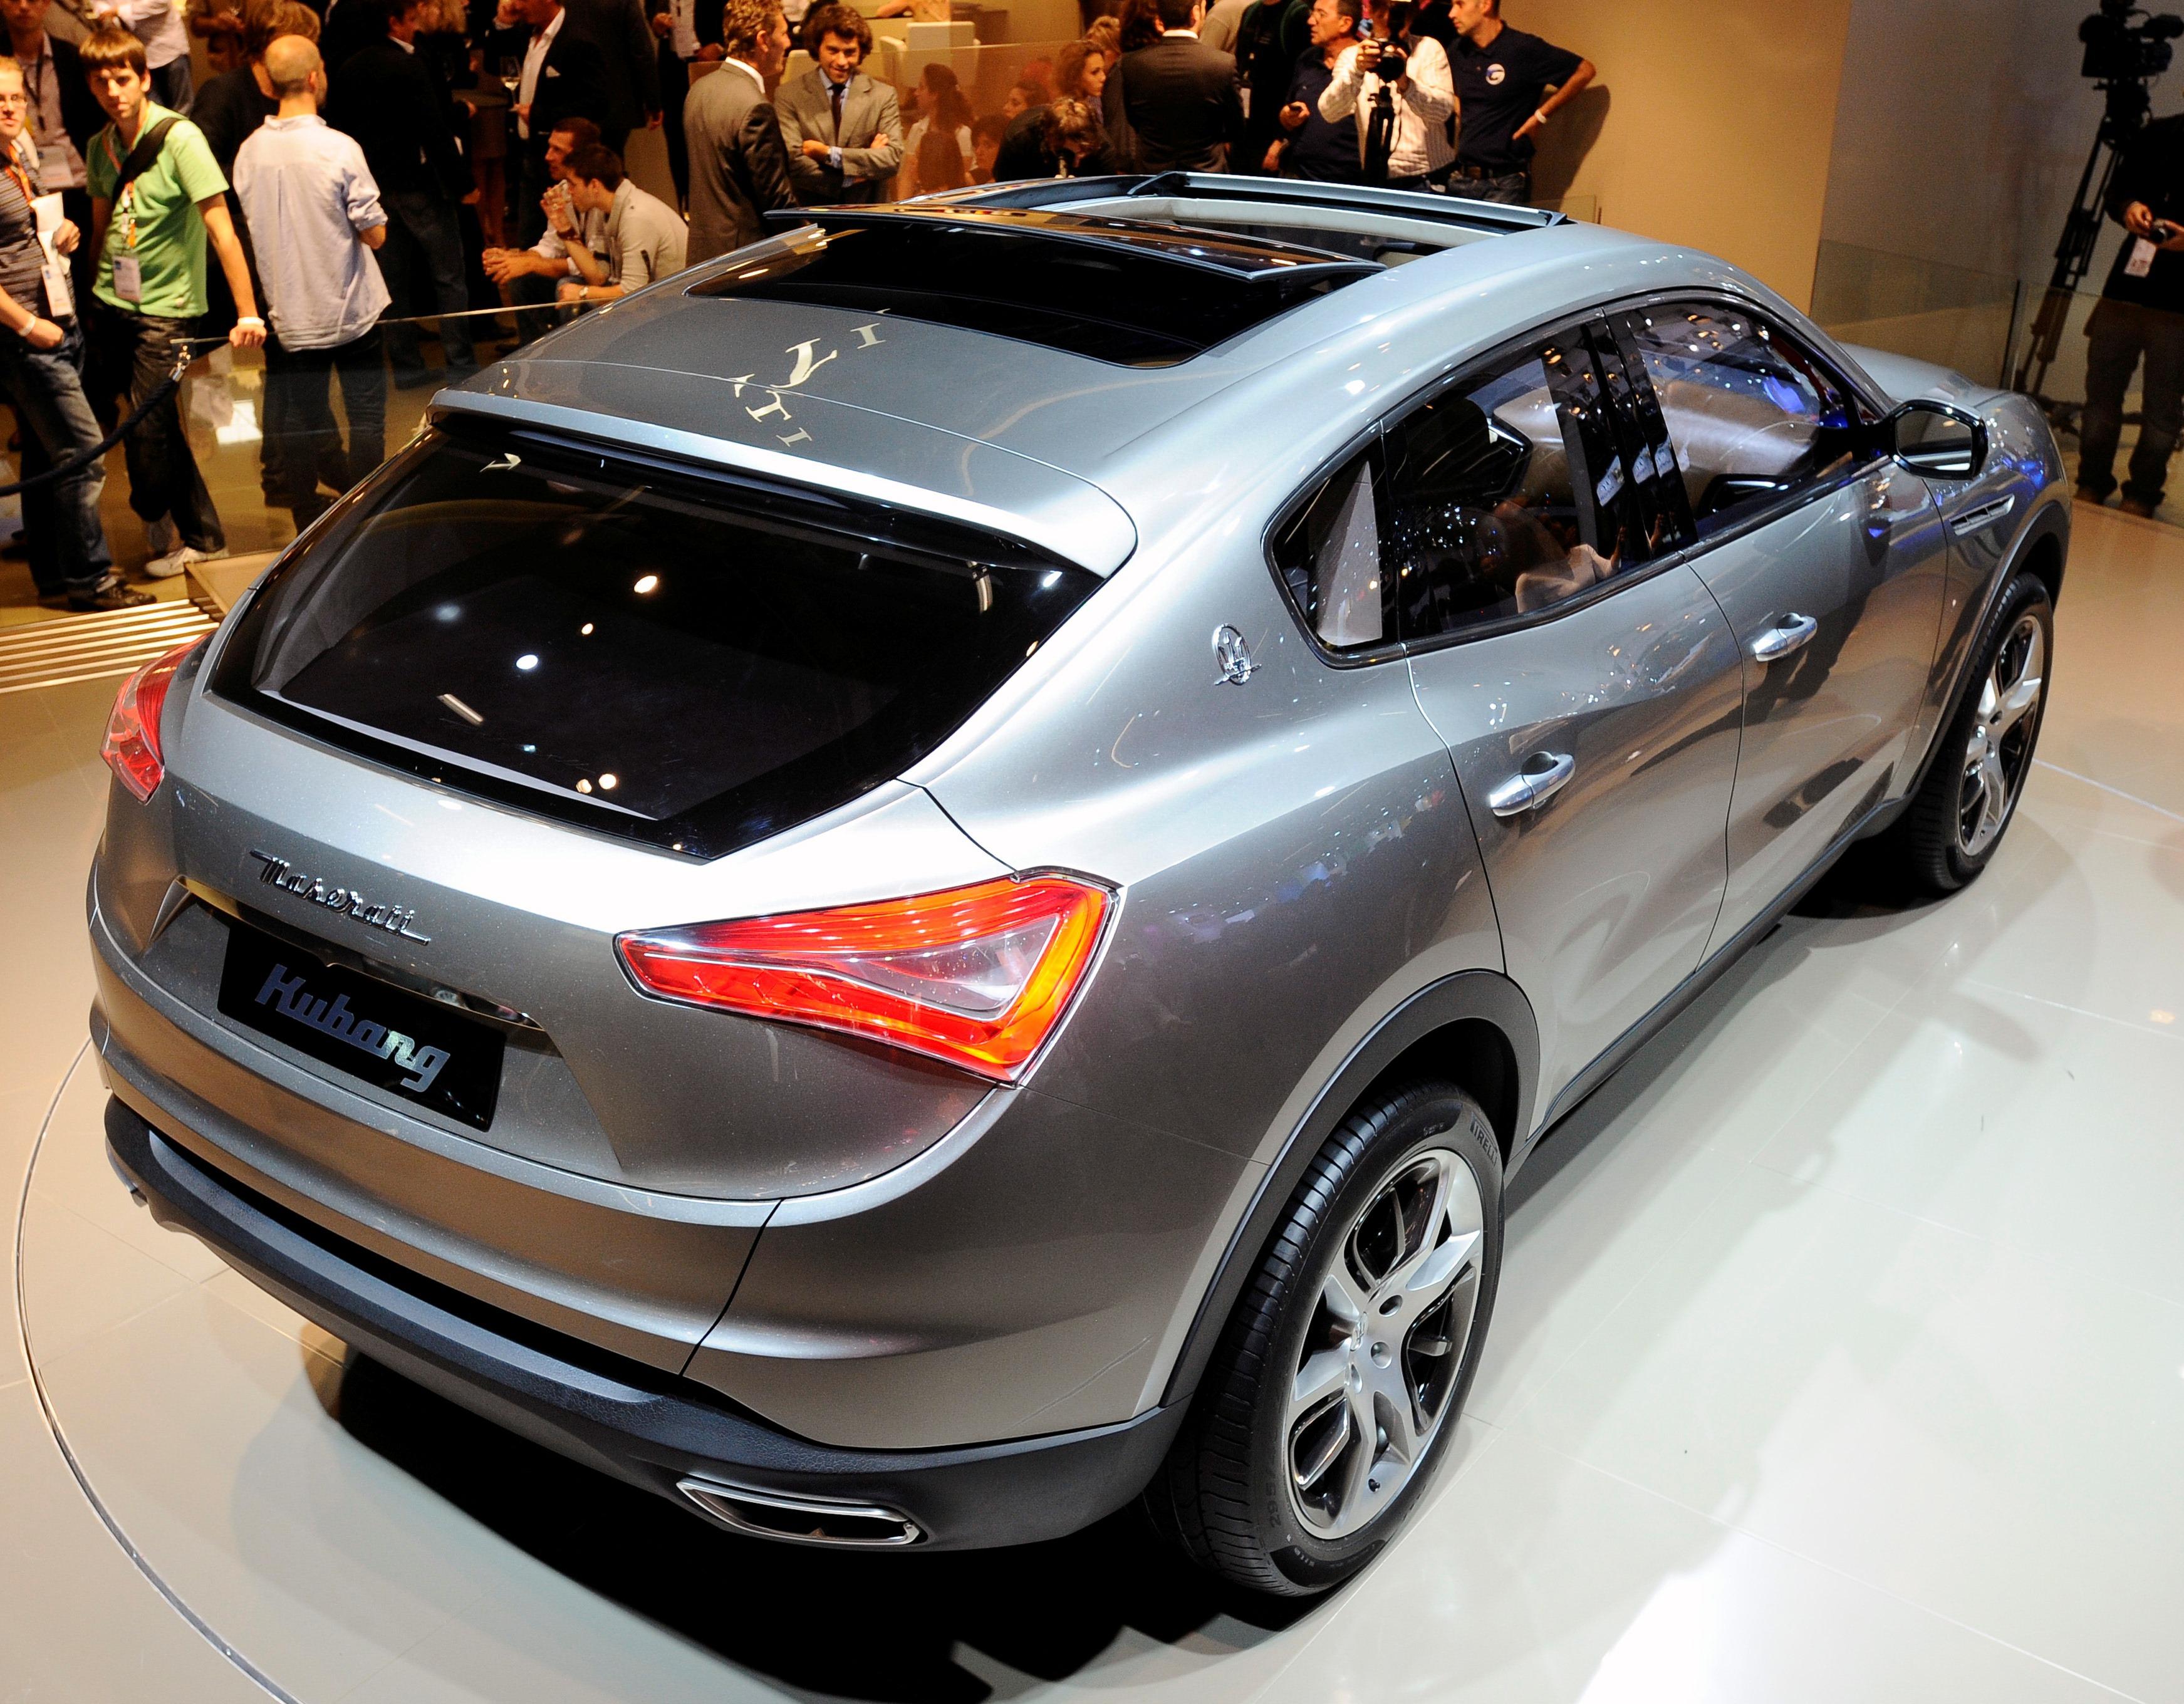 Maserati Levante SUV Photos